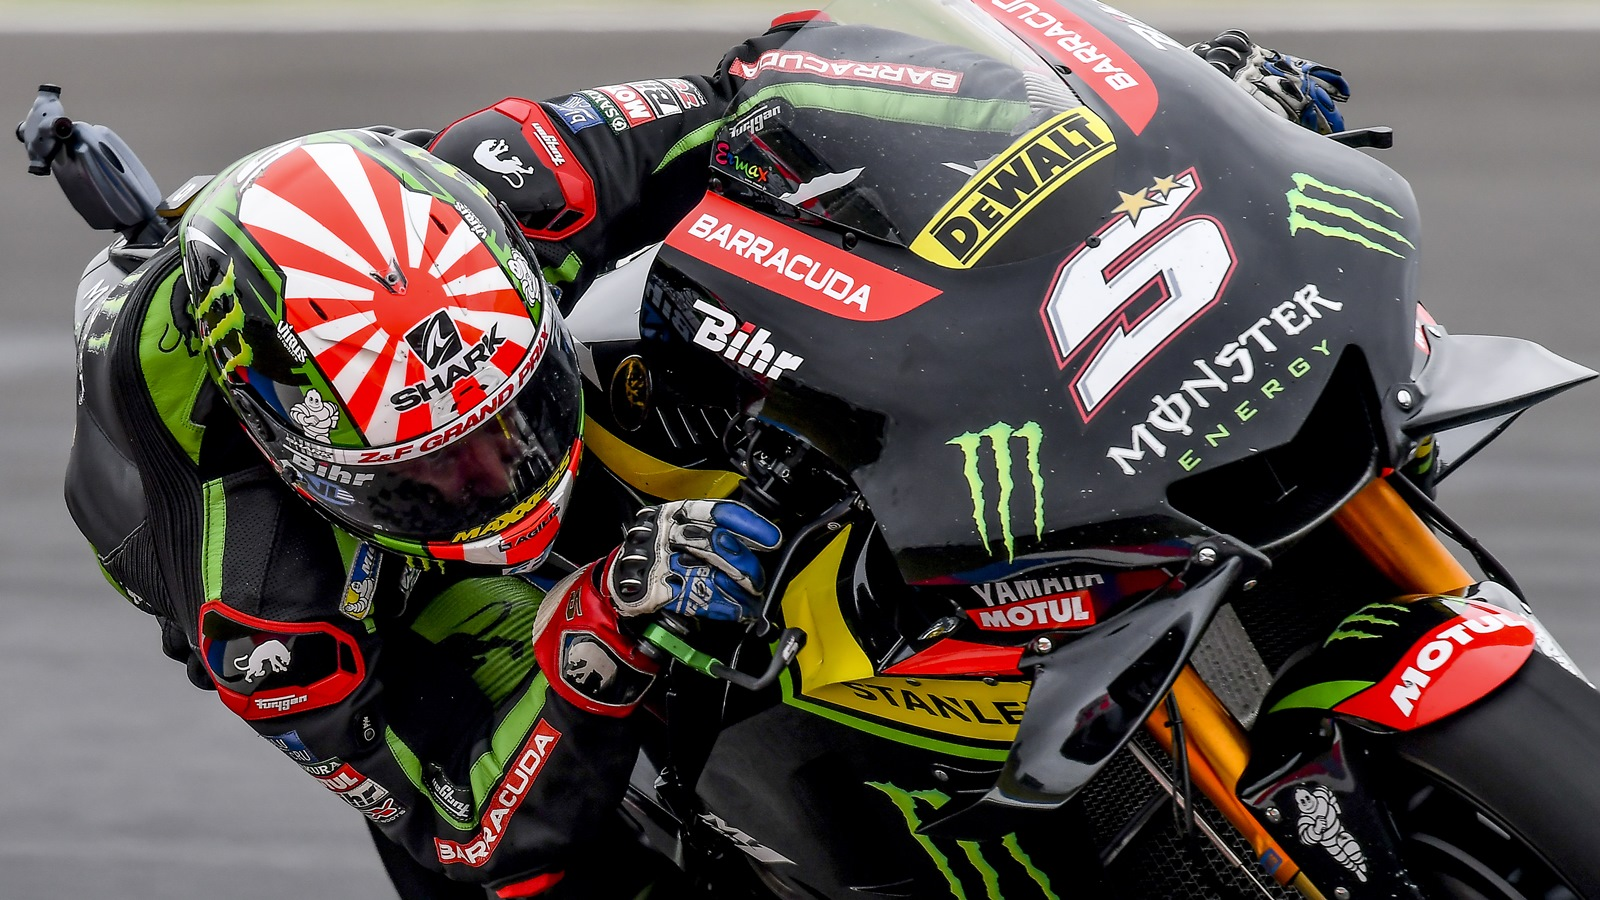 motogp saison 2019